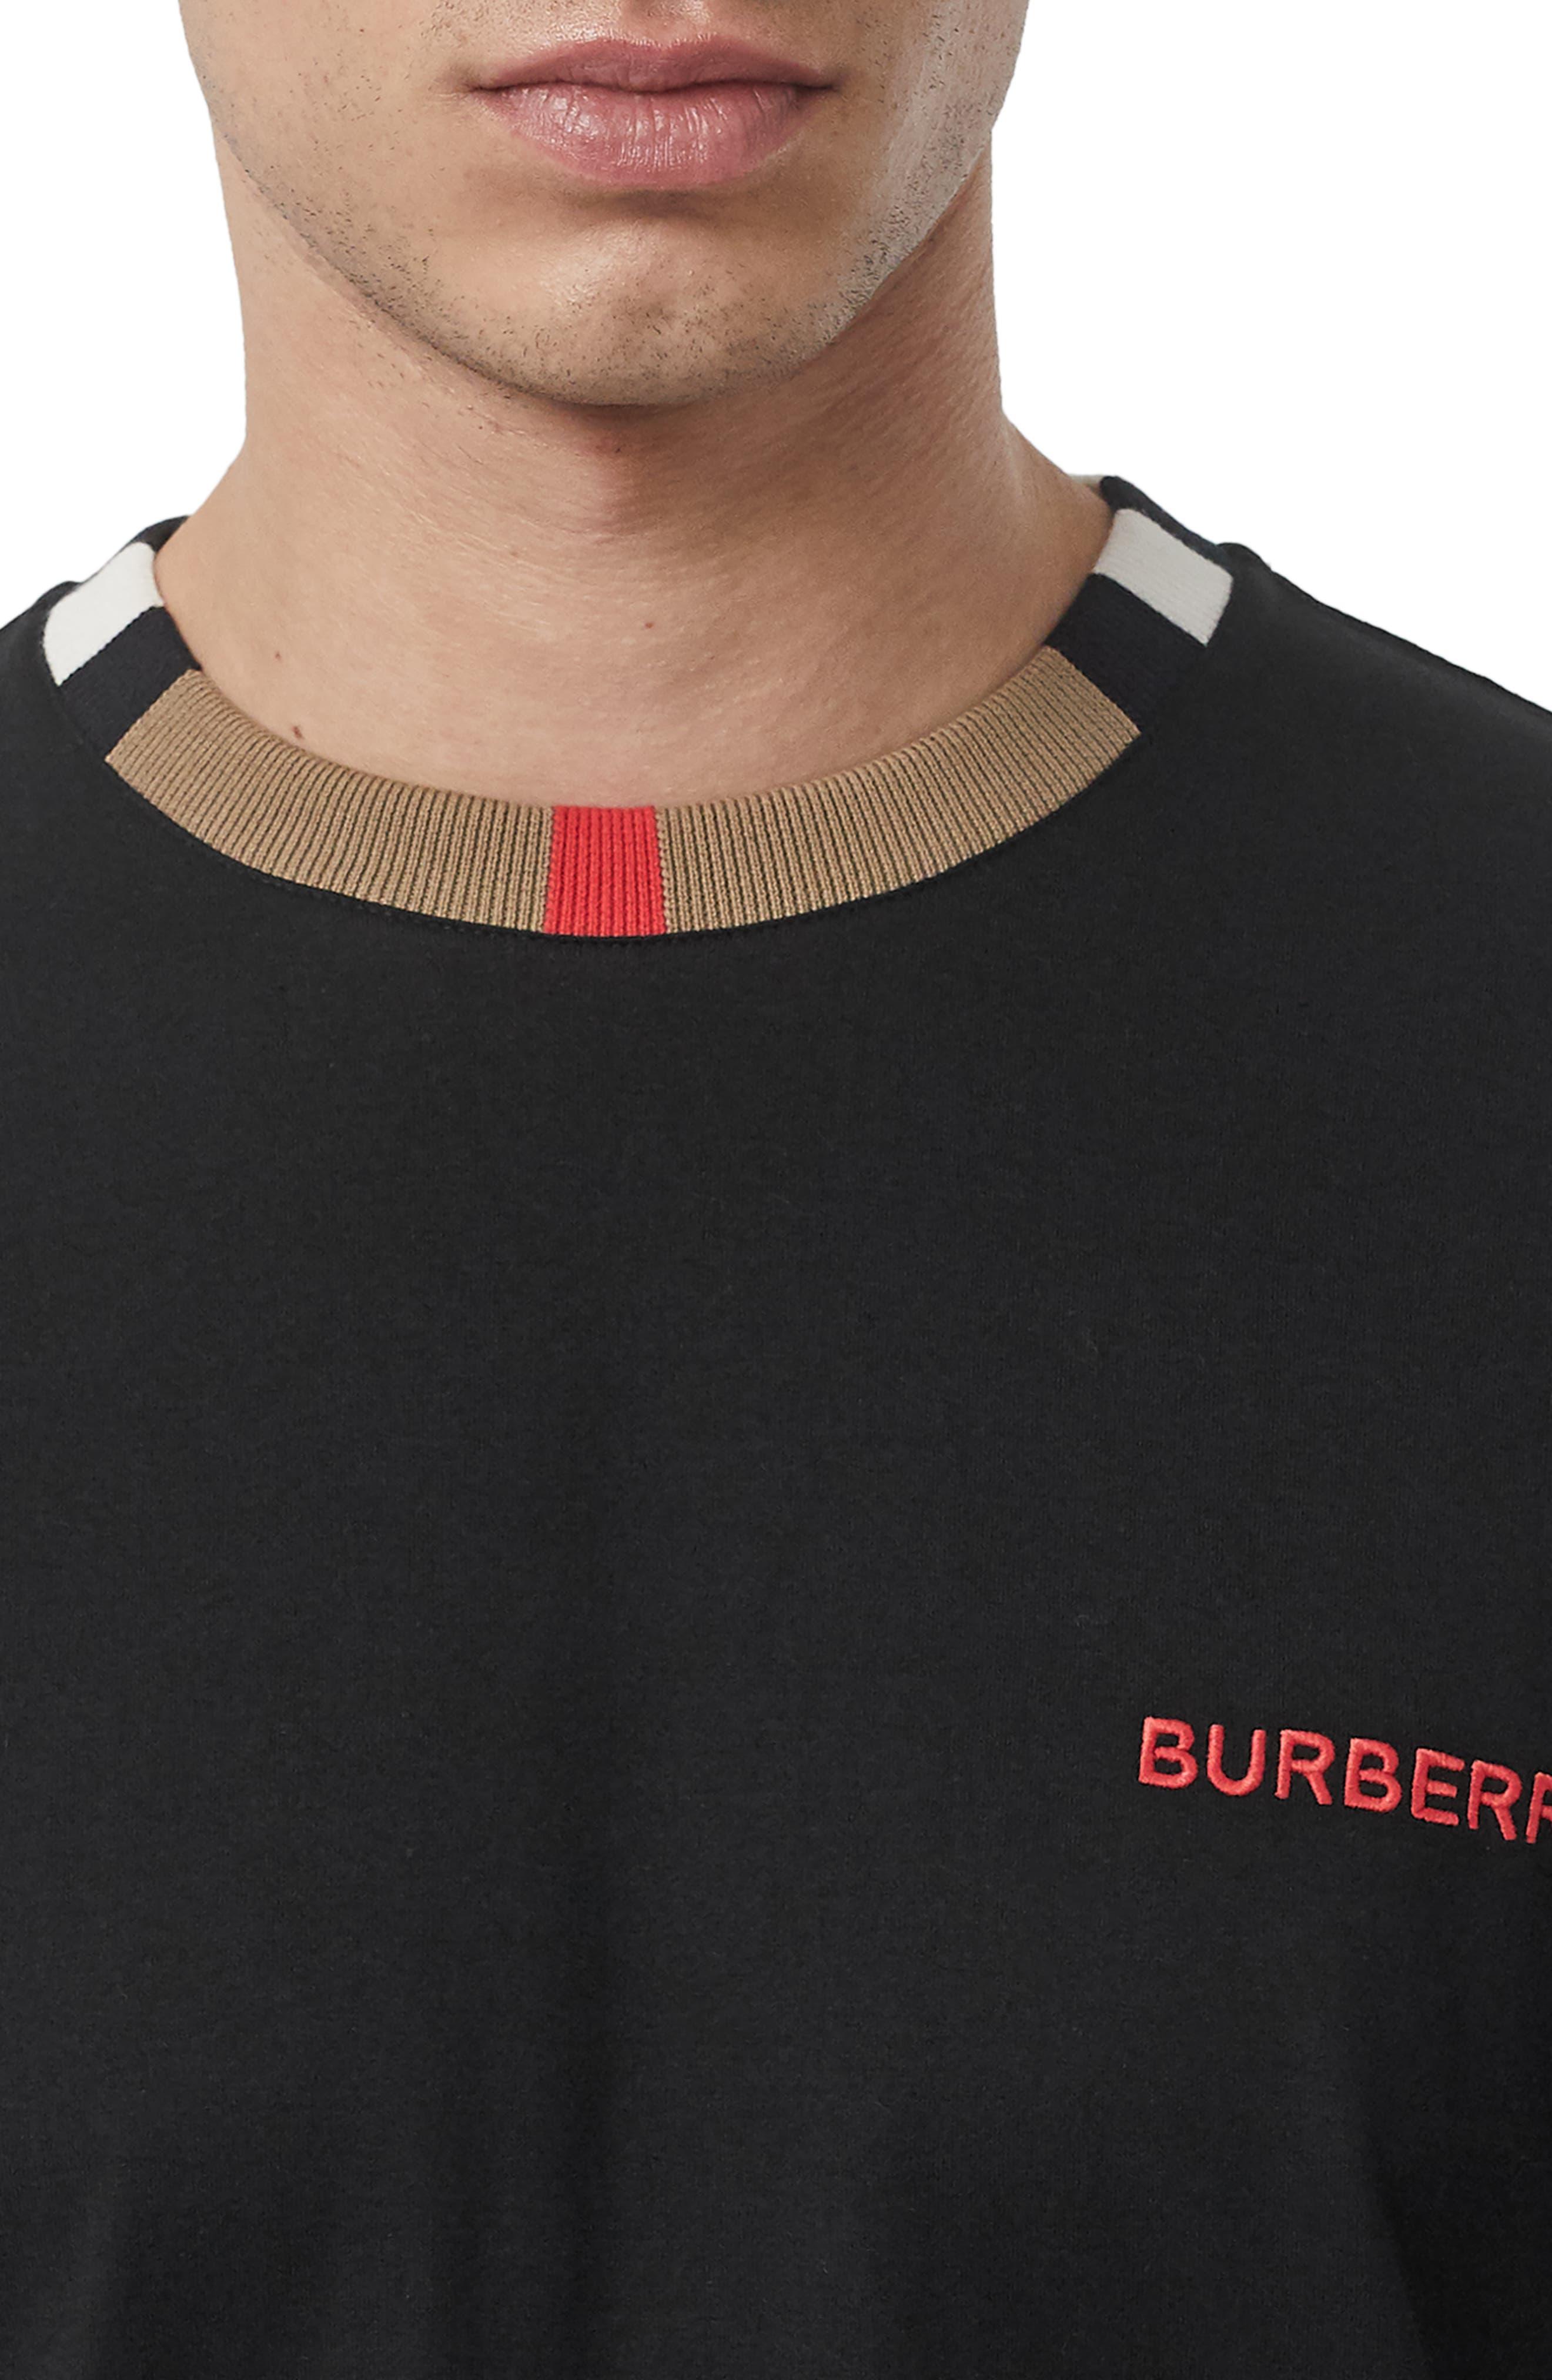 BURBERRY, Jayson Icon Stripe T-Shirt, Alternate thumbnail 4, color, BLACK